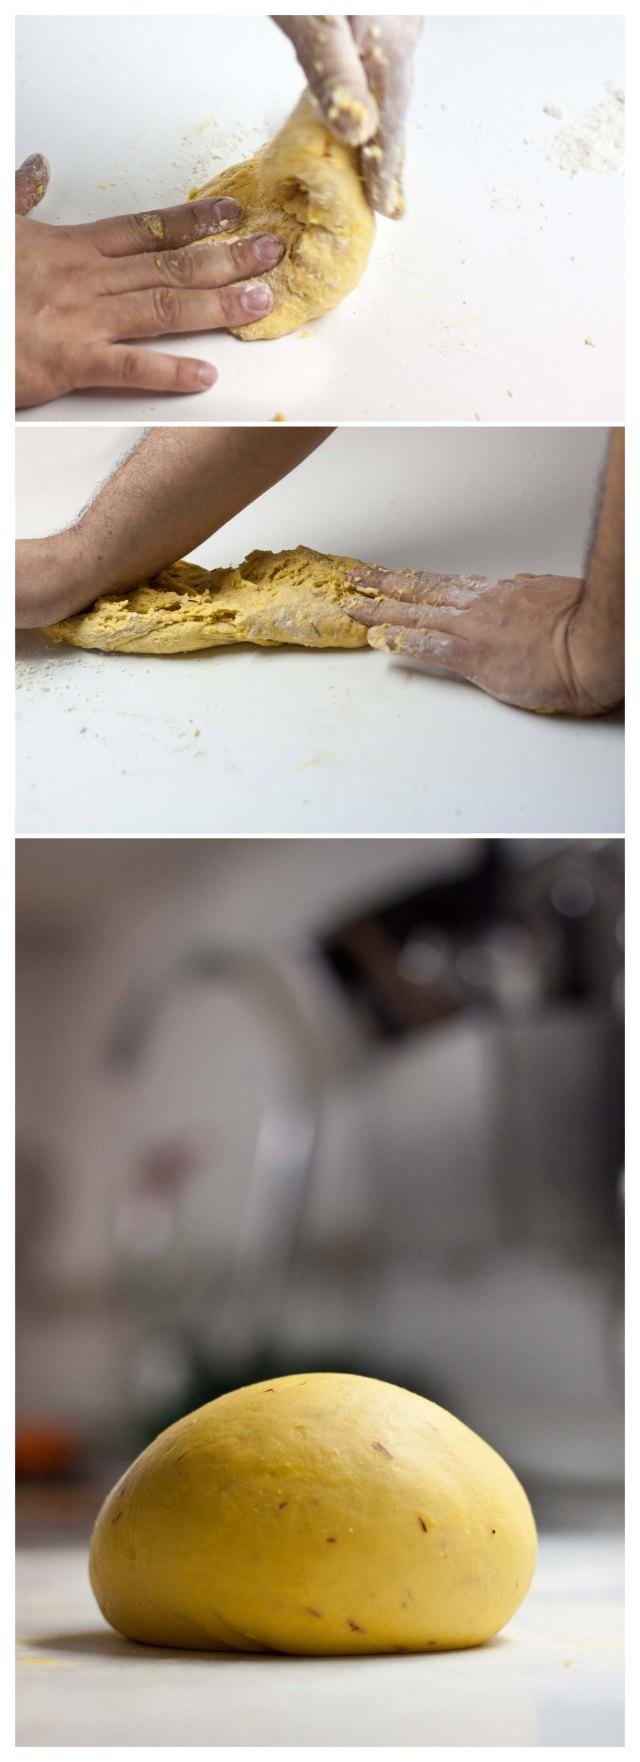 Elaboración-de-pasta-al-azafrán